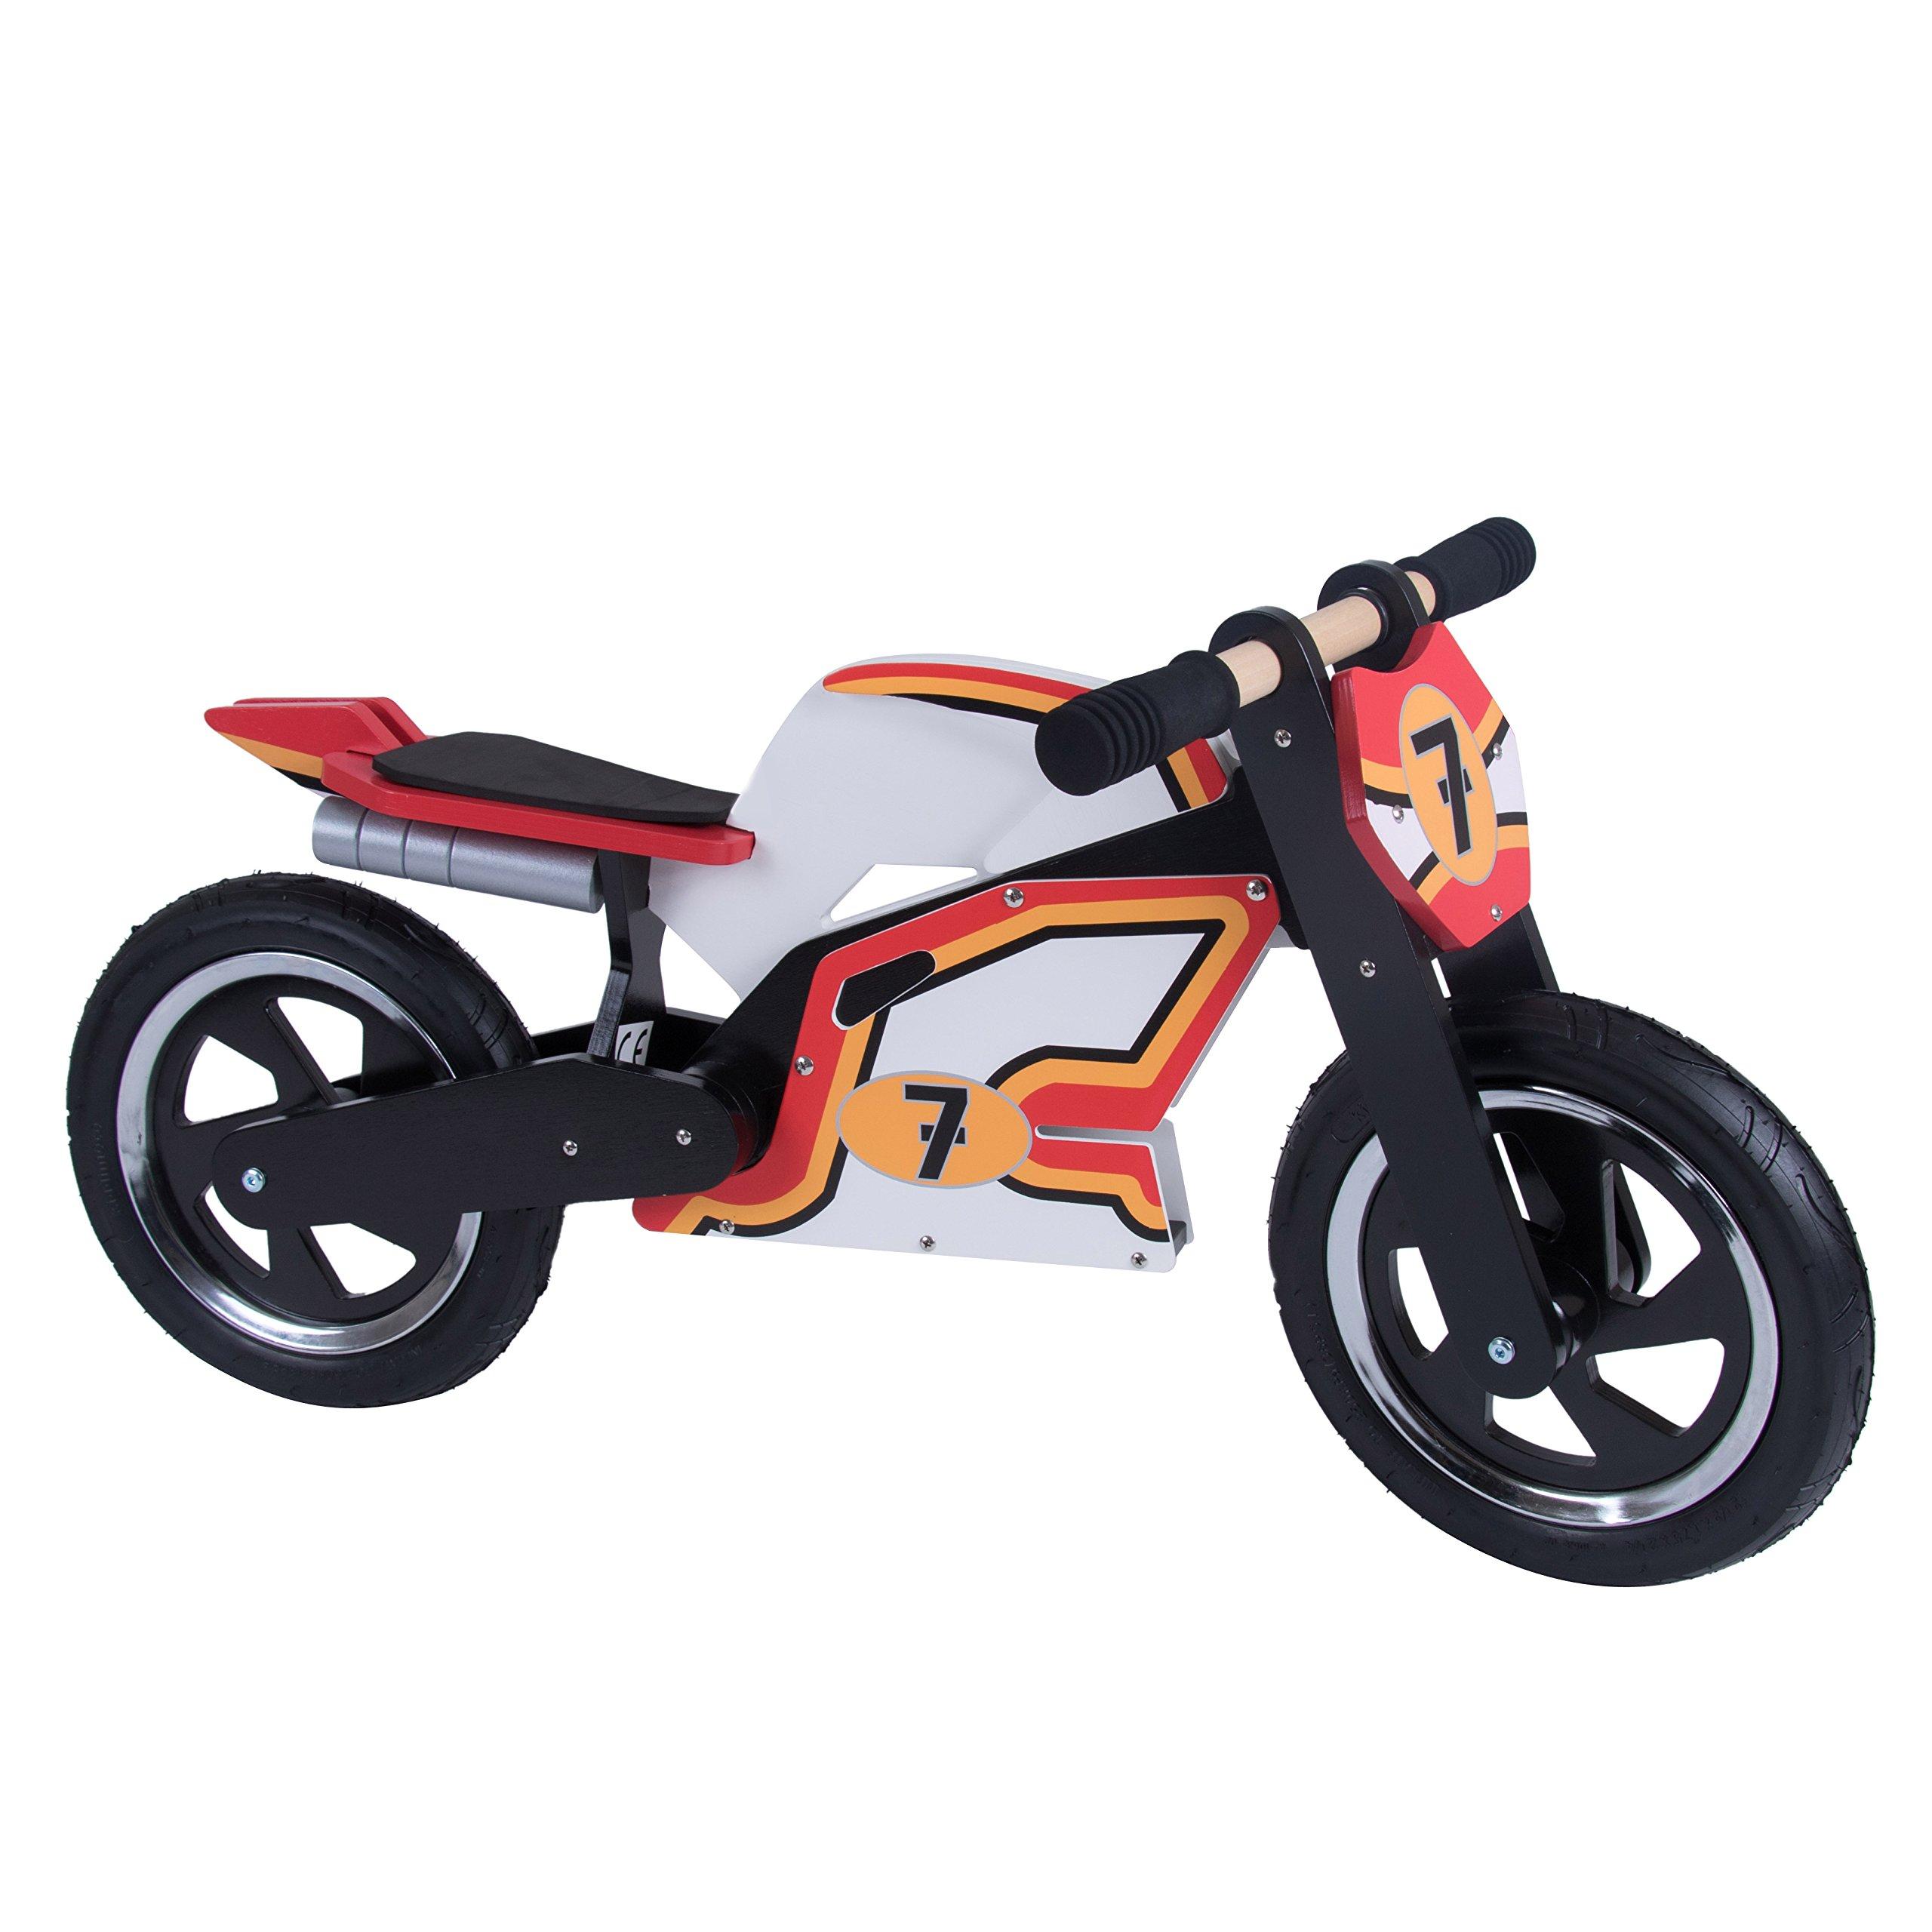 Kids Bikes /& Balance Bike Tricycle KIDDIMOTO Aluminium Mini Kids Bike Bell with Crisp Sound for Scooter